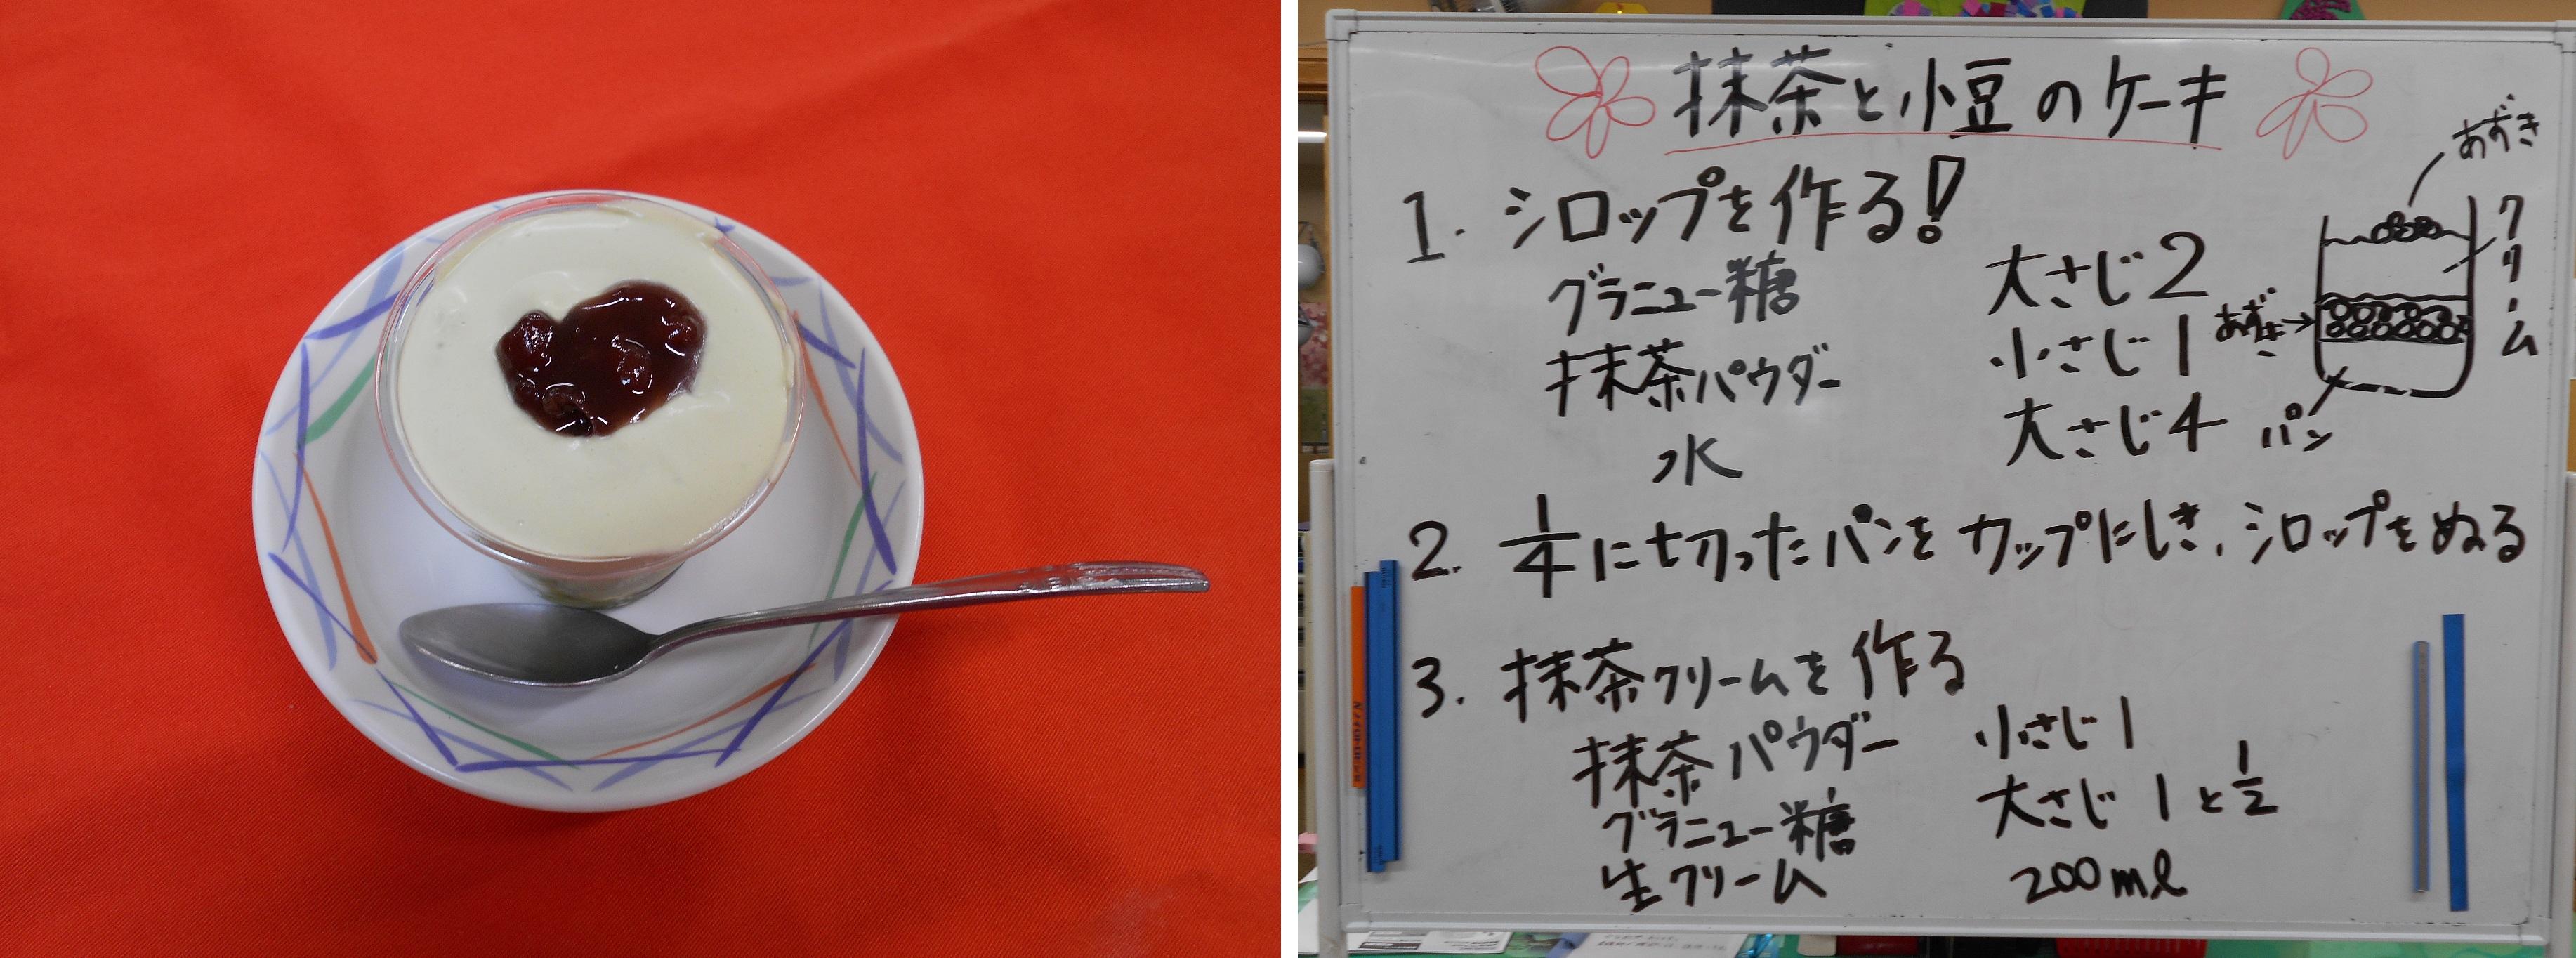 △抹茶ケーキ完成.JPG